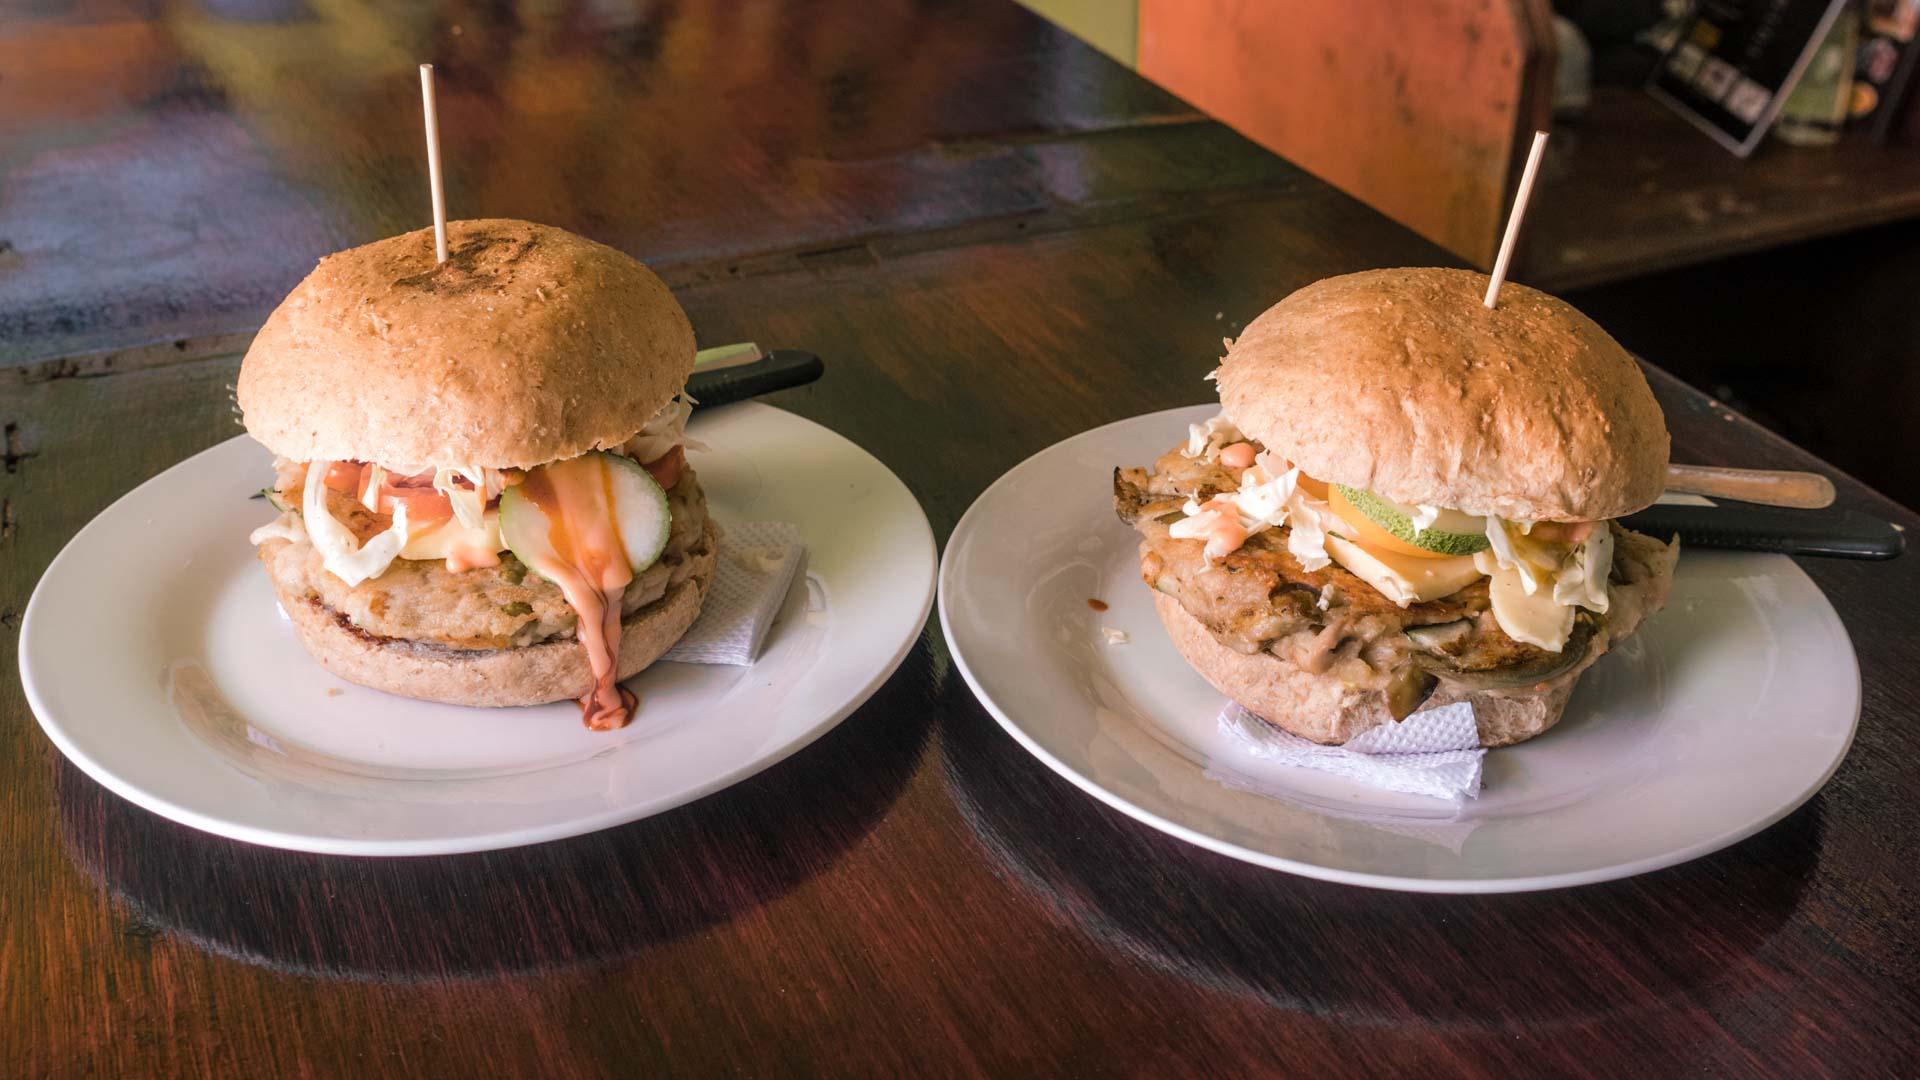 Paul's Magic burgers in El Nido